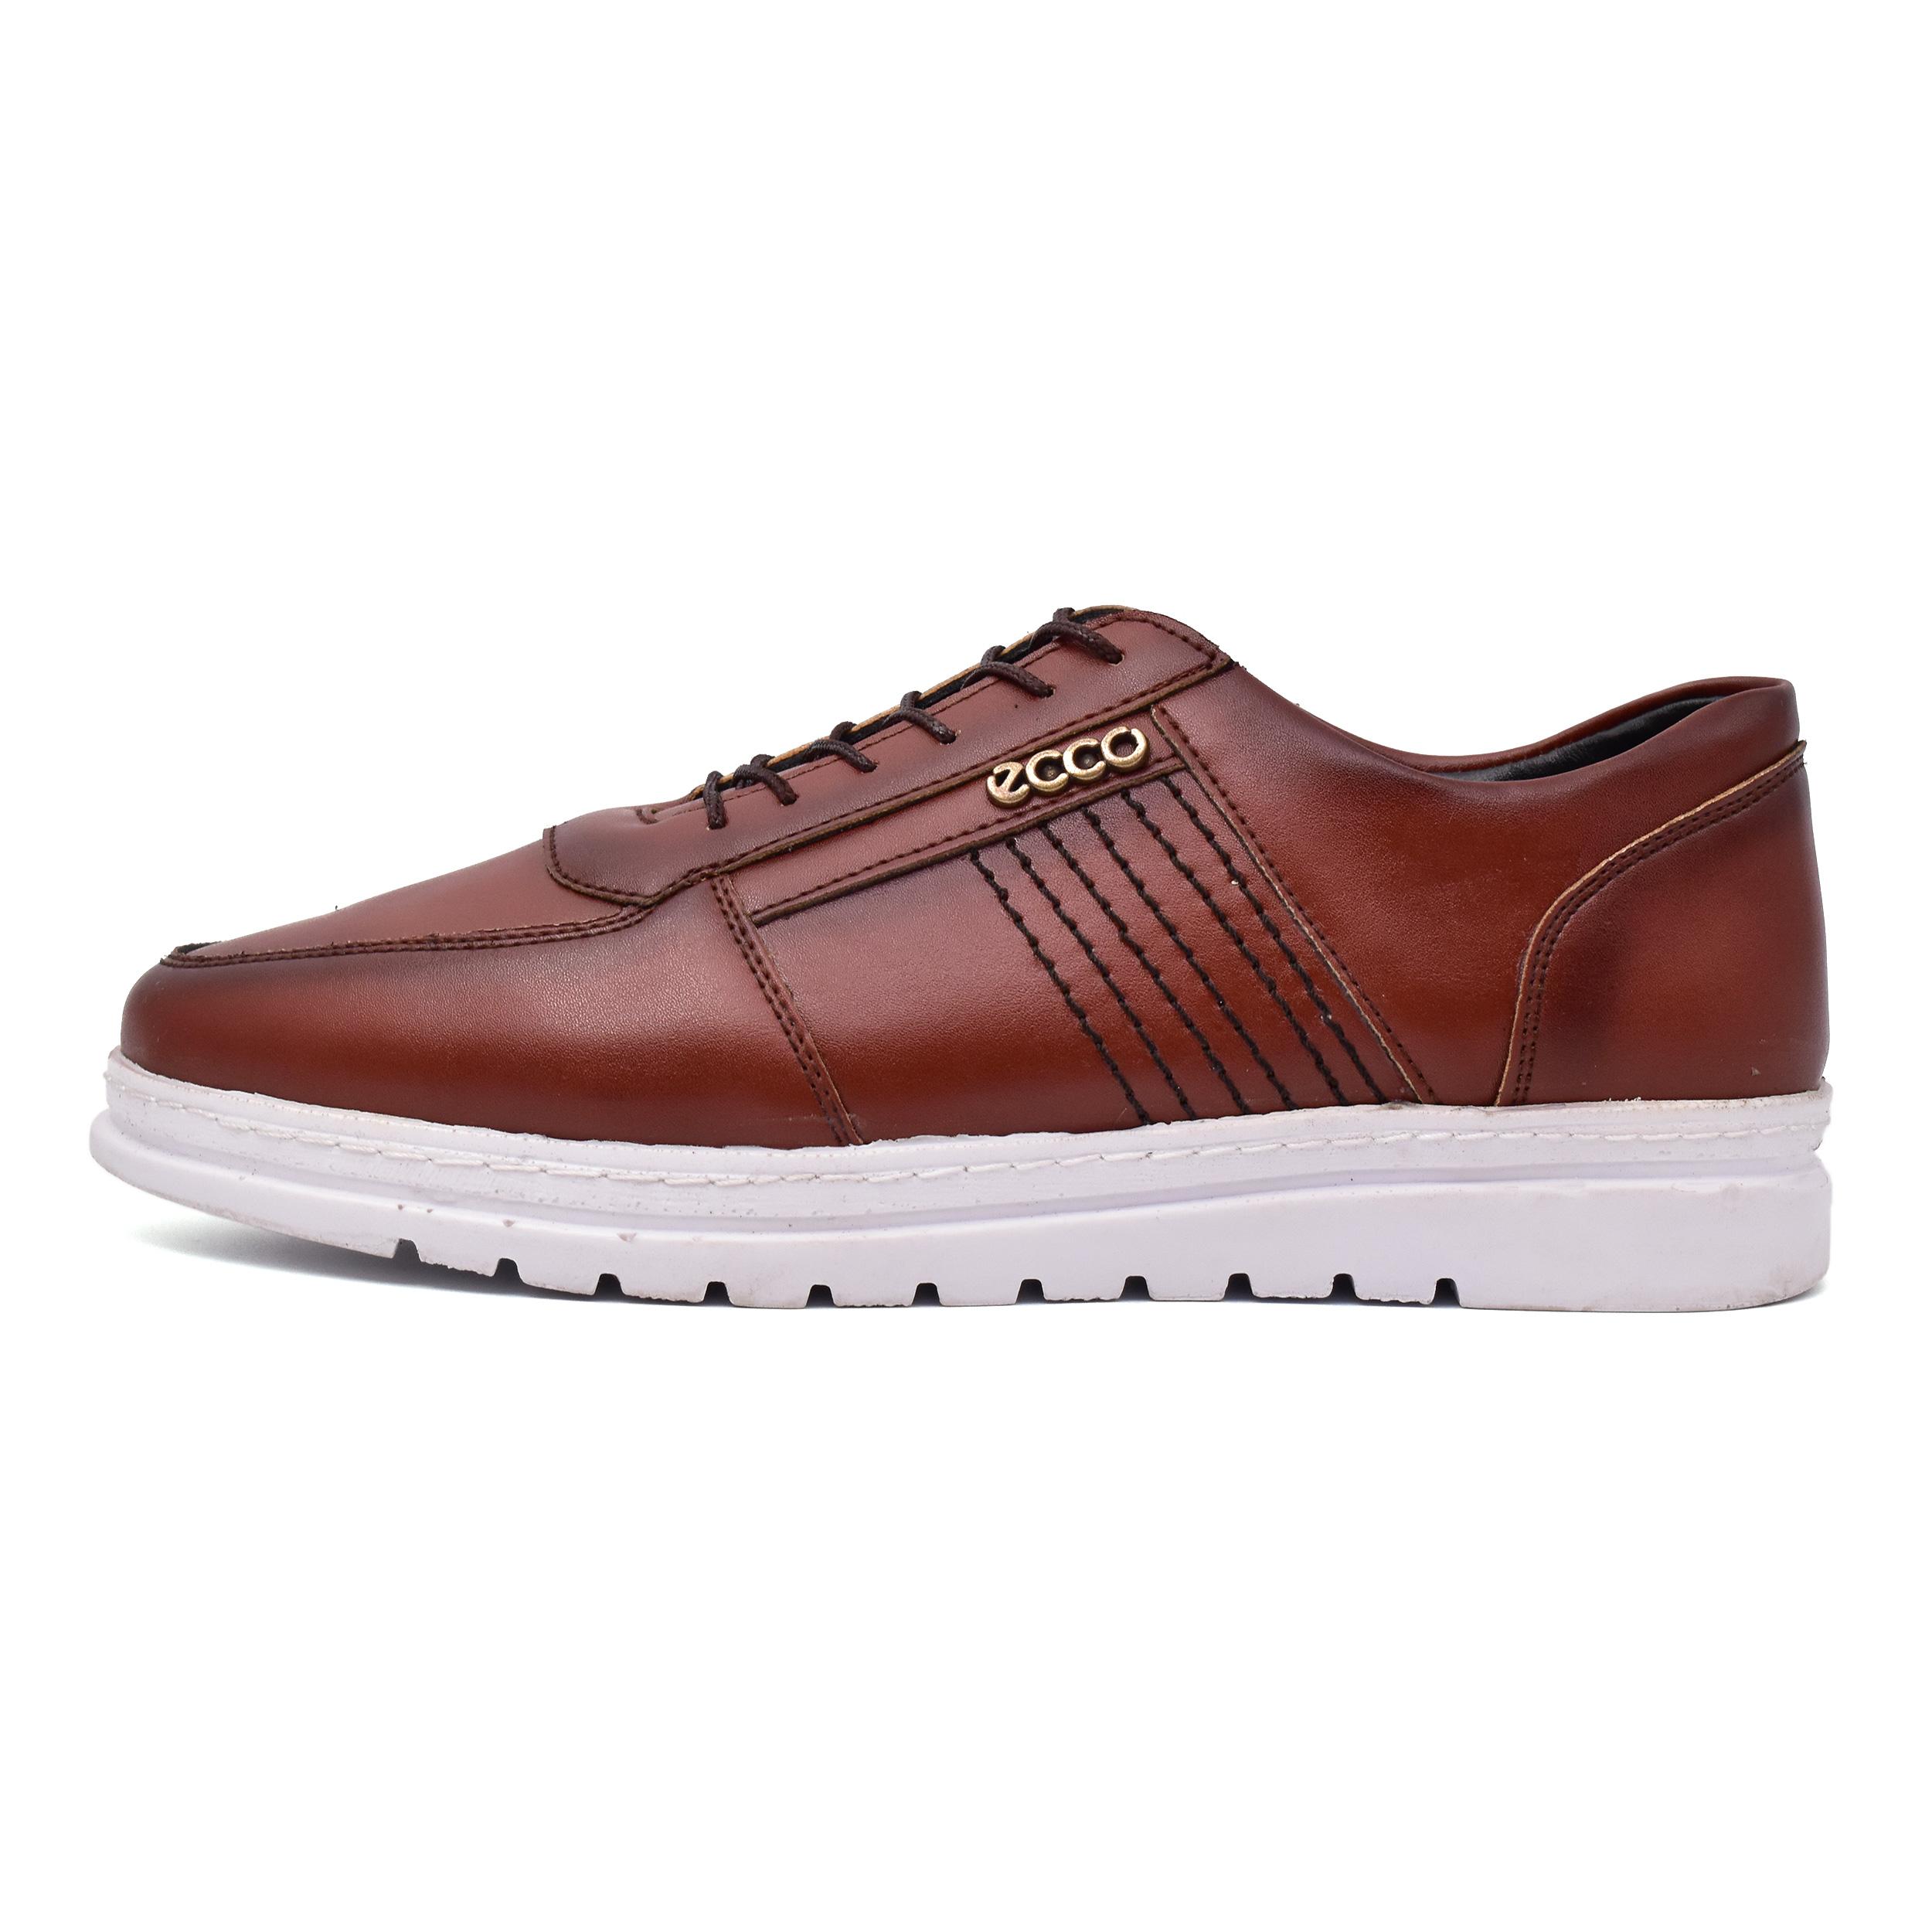 کفش روزمره   مردانه مدل جی ال کد JA6053